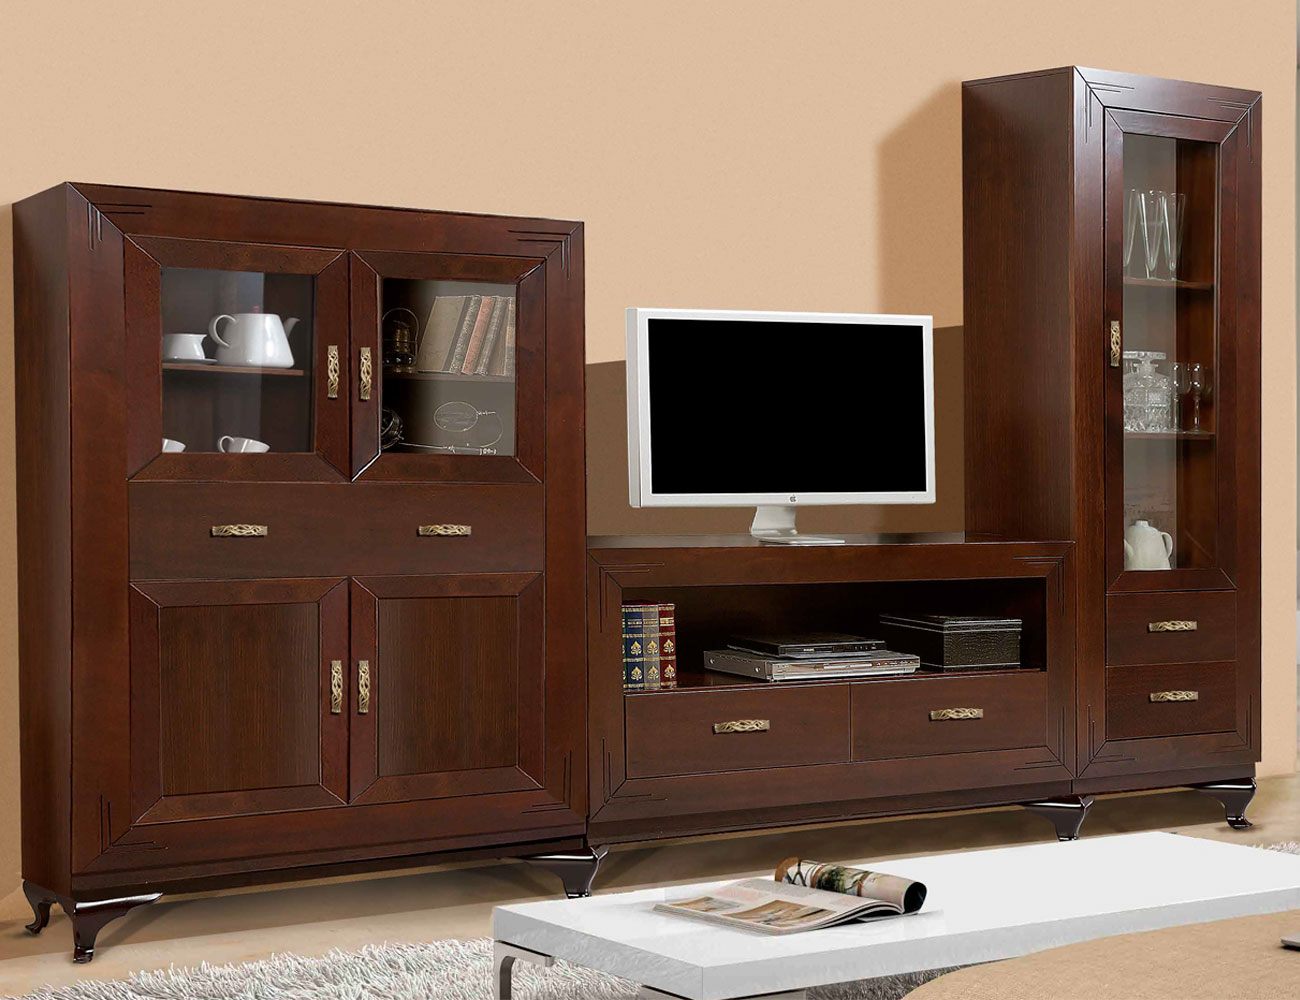 Composicion 12 mueble salon comedor madera pino nogal